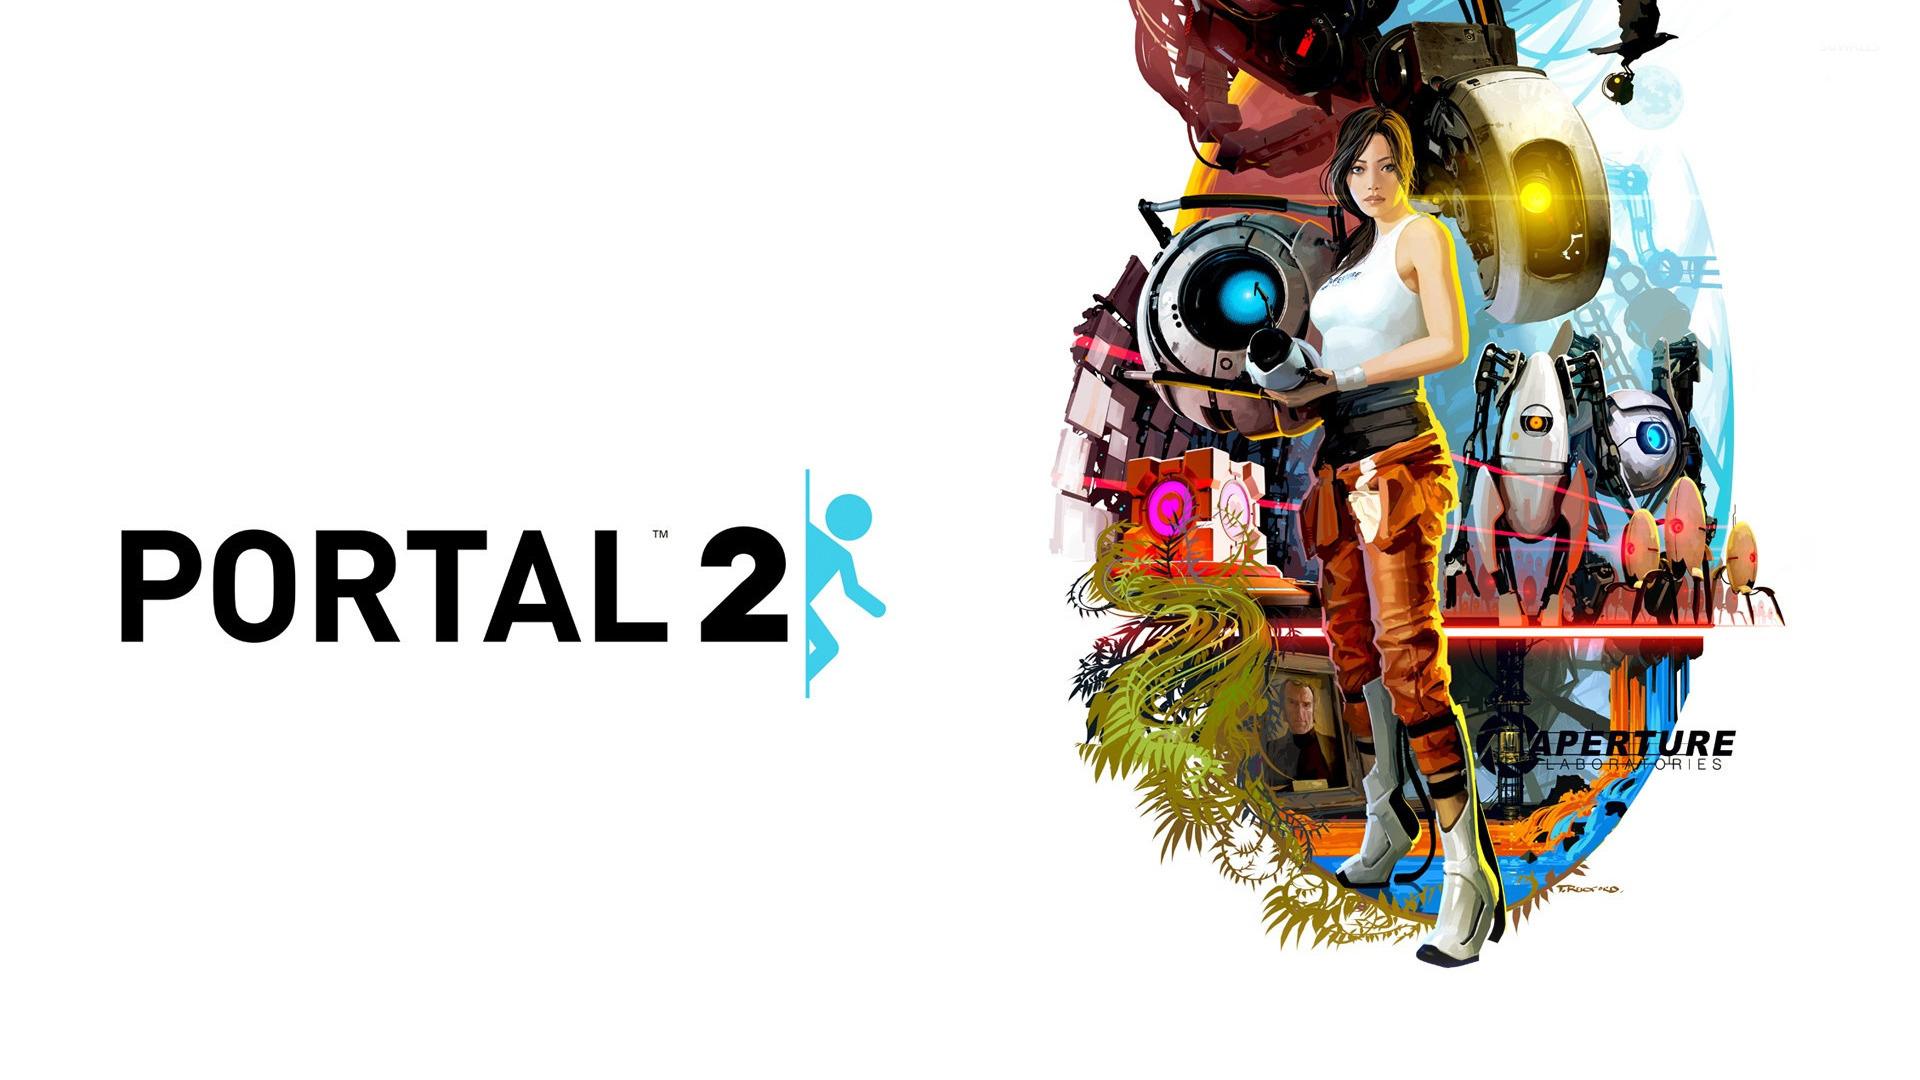 Portal 2 wallpaper   Game wallpapers   15265 1920x1080